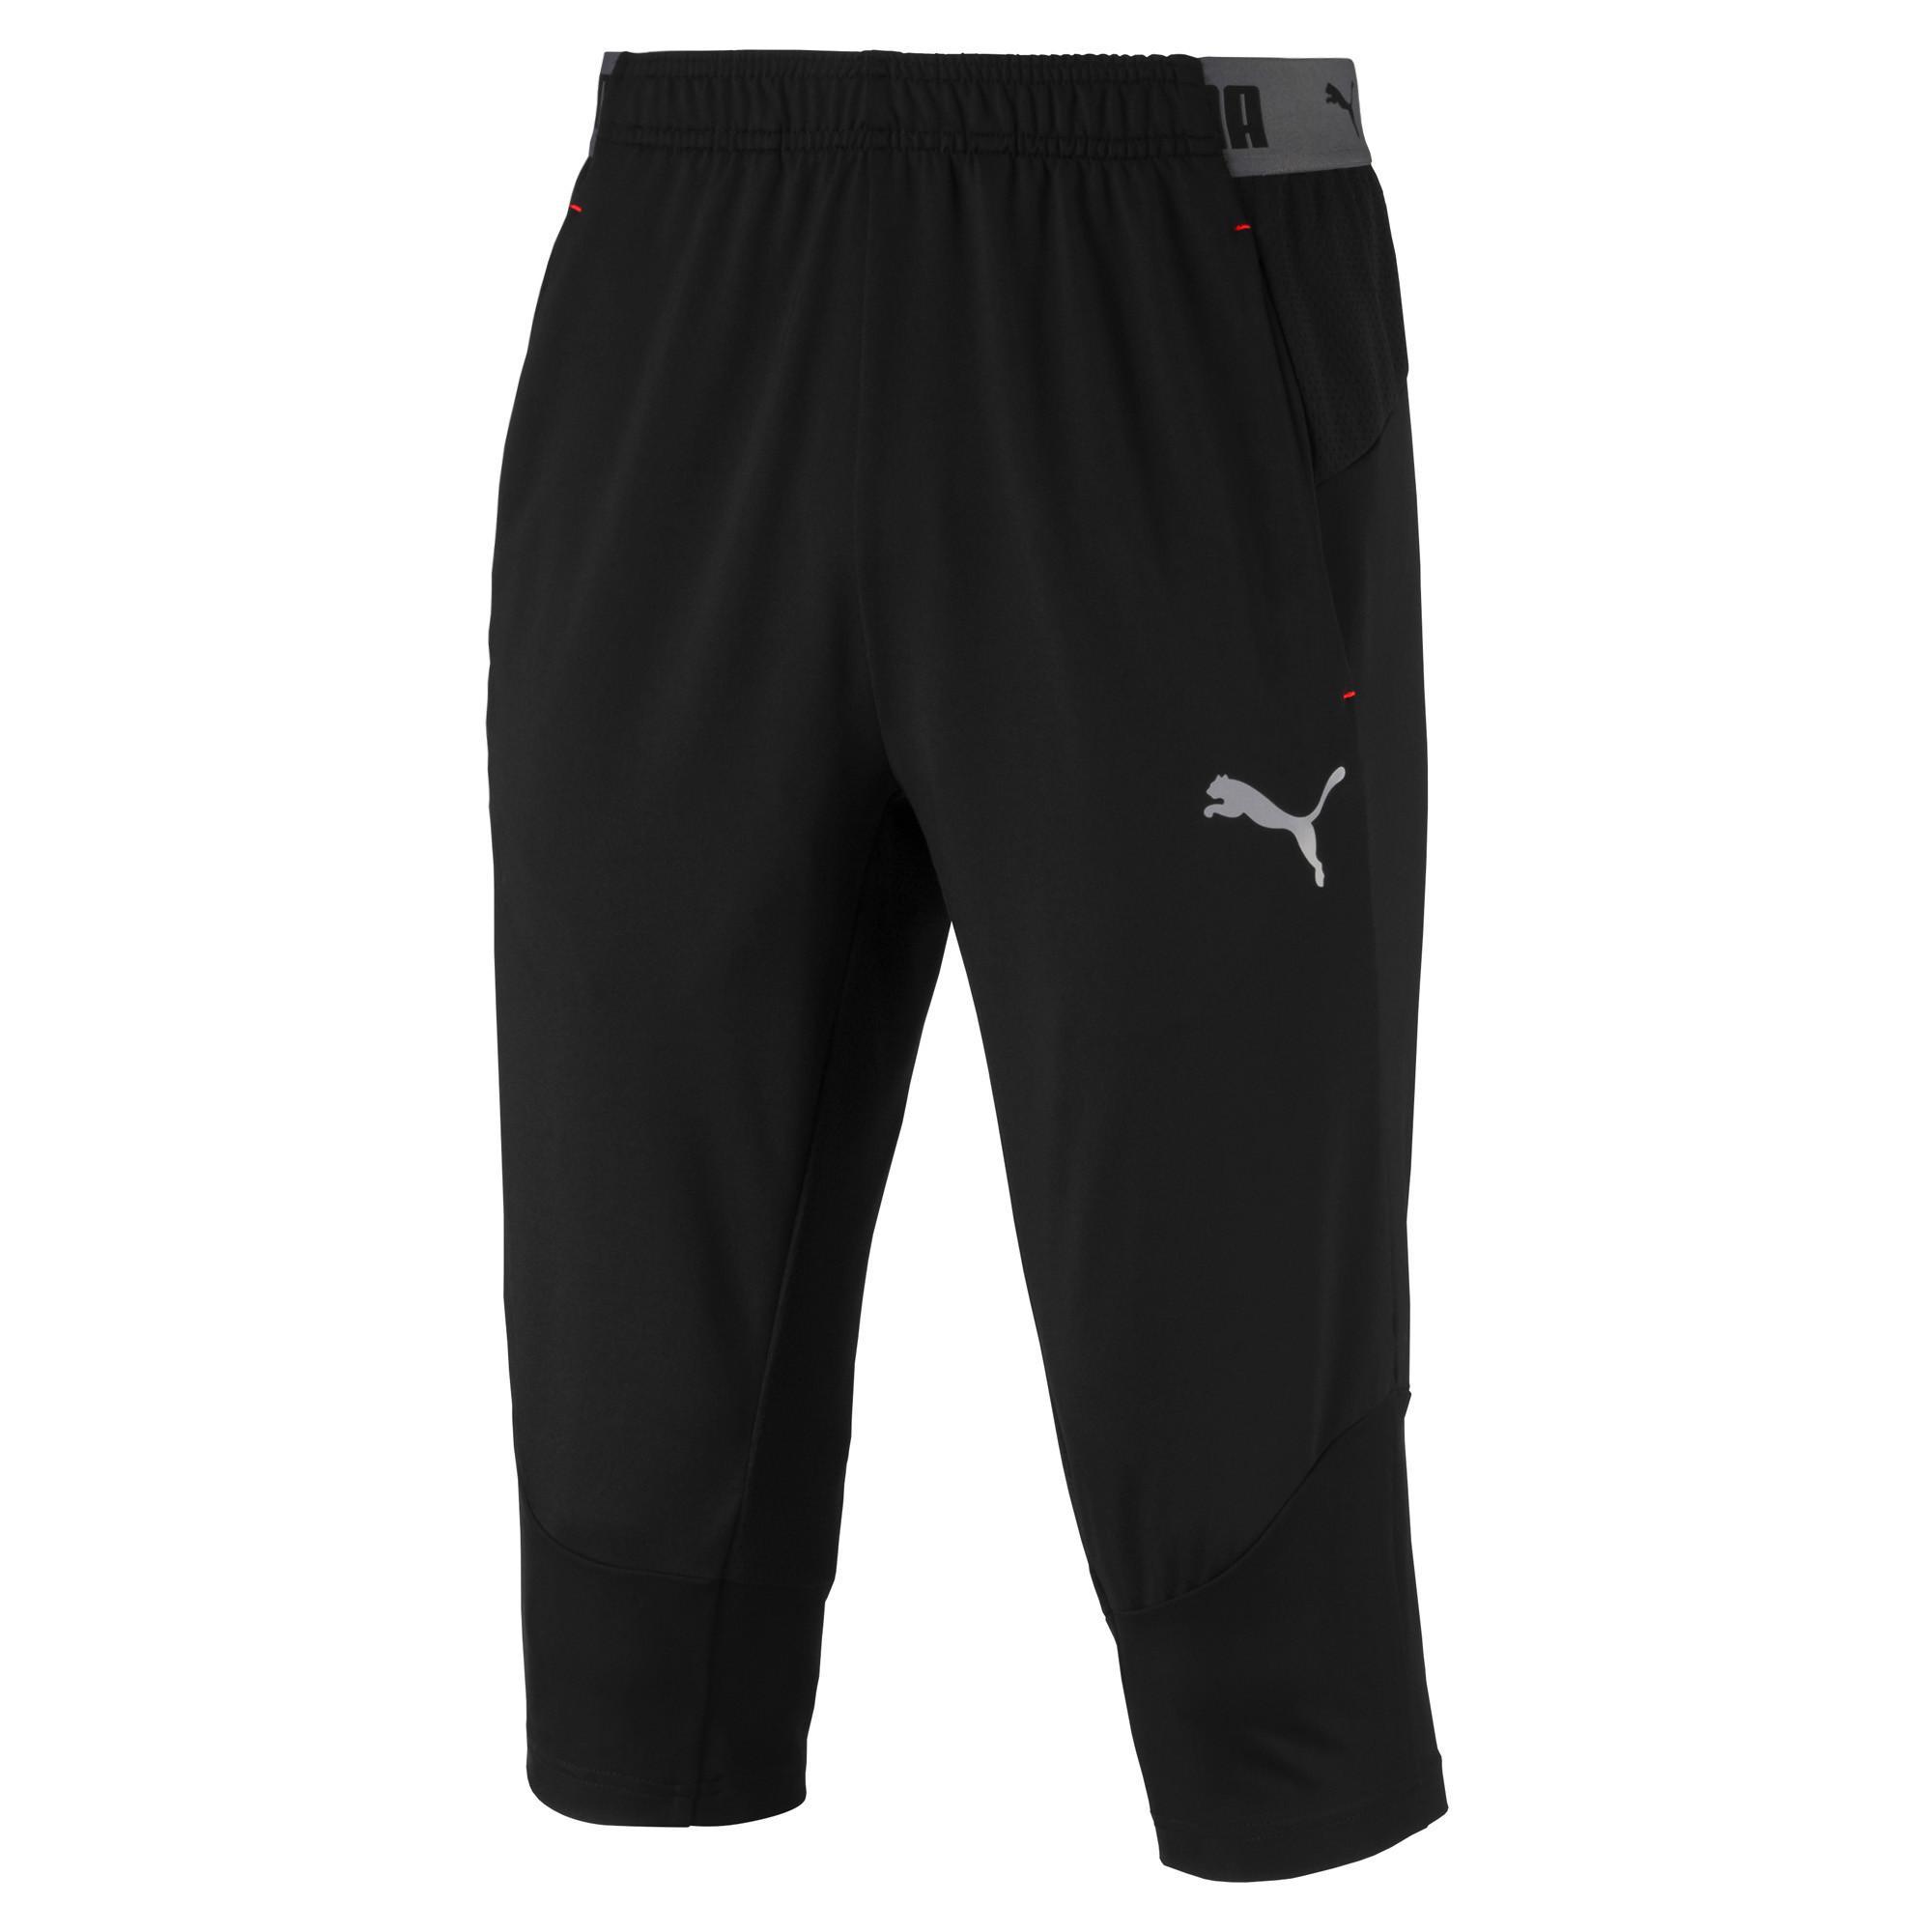 92483a3bc0eb Lyst - PUMA Ftblnxt Men s 3 4 Length Training Pants in Black for Men